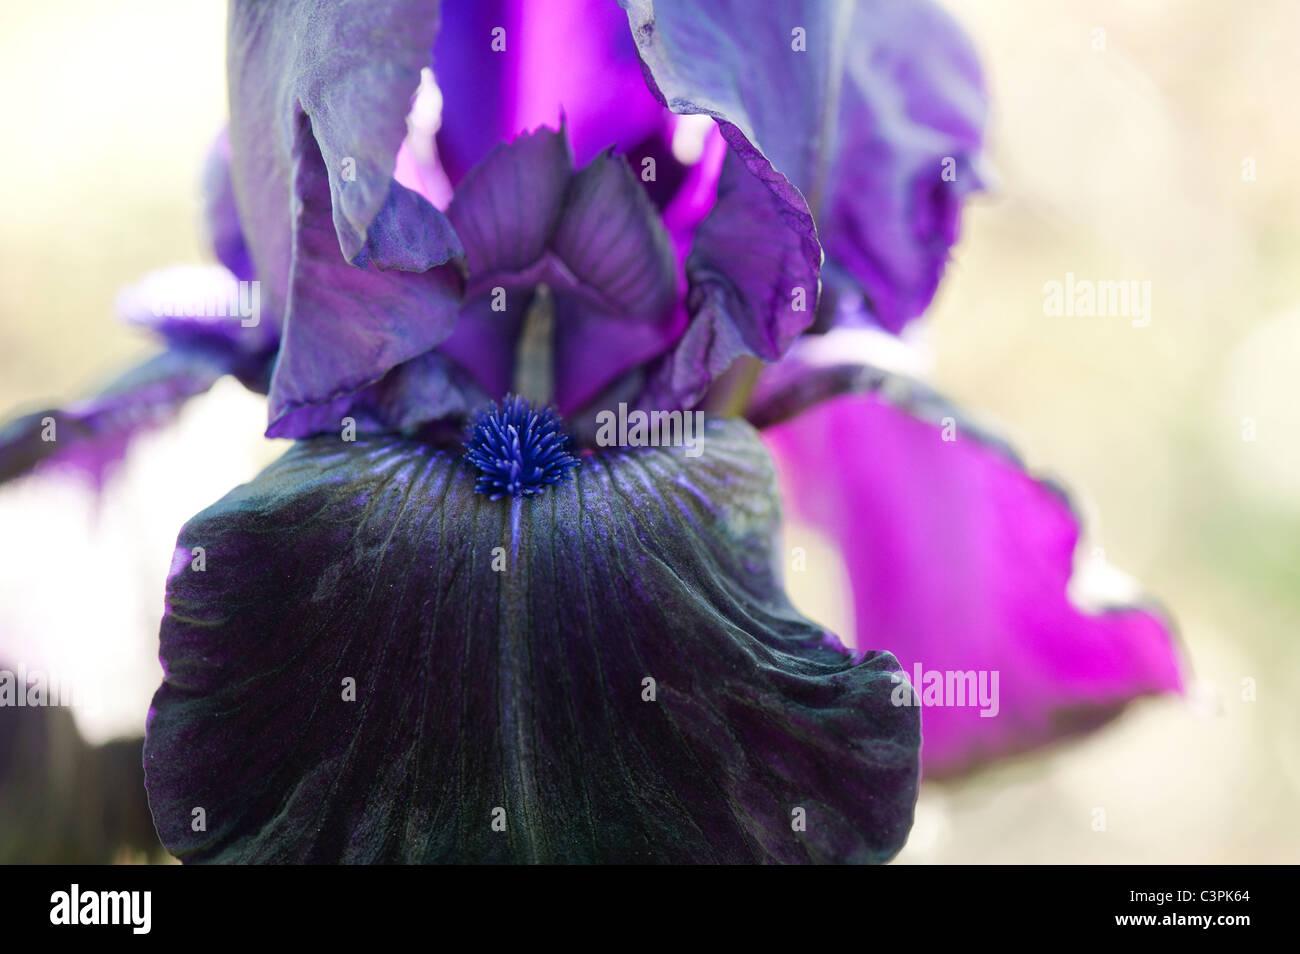 Tall Bearded Iris 'Licorice stick' flower - Stock Image